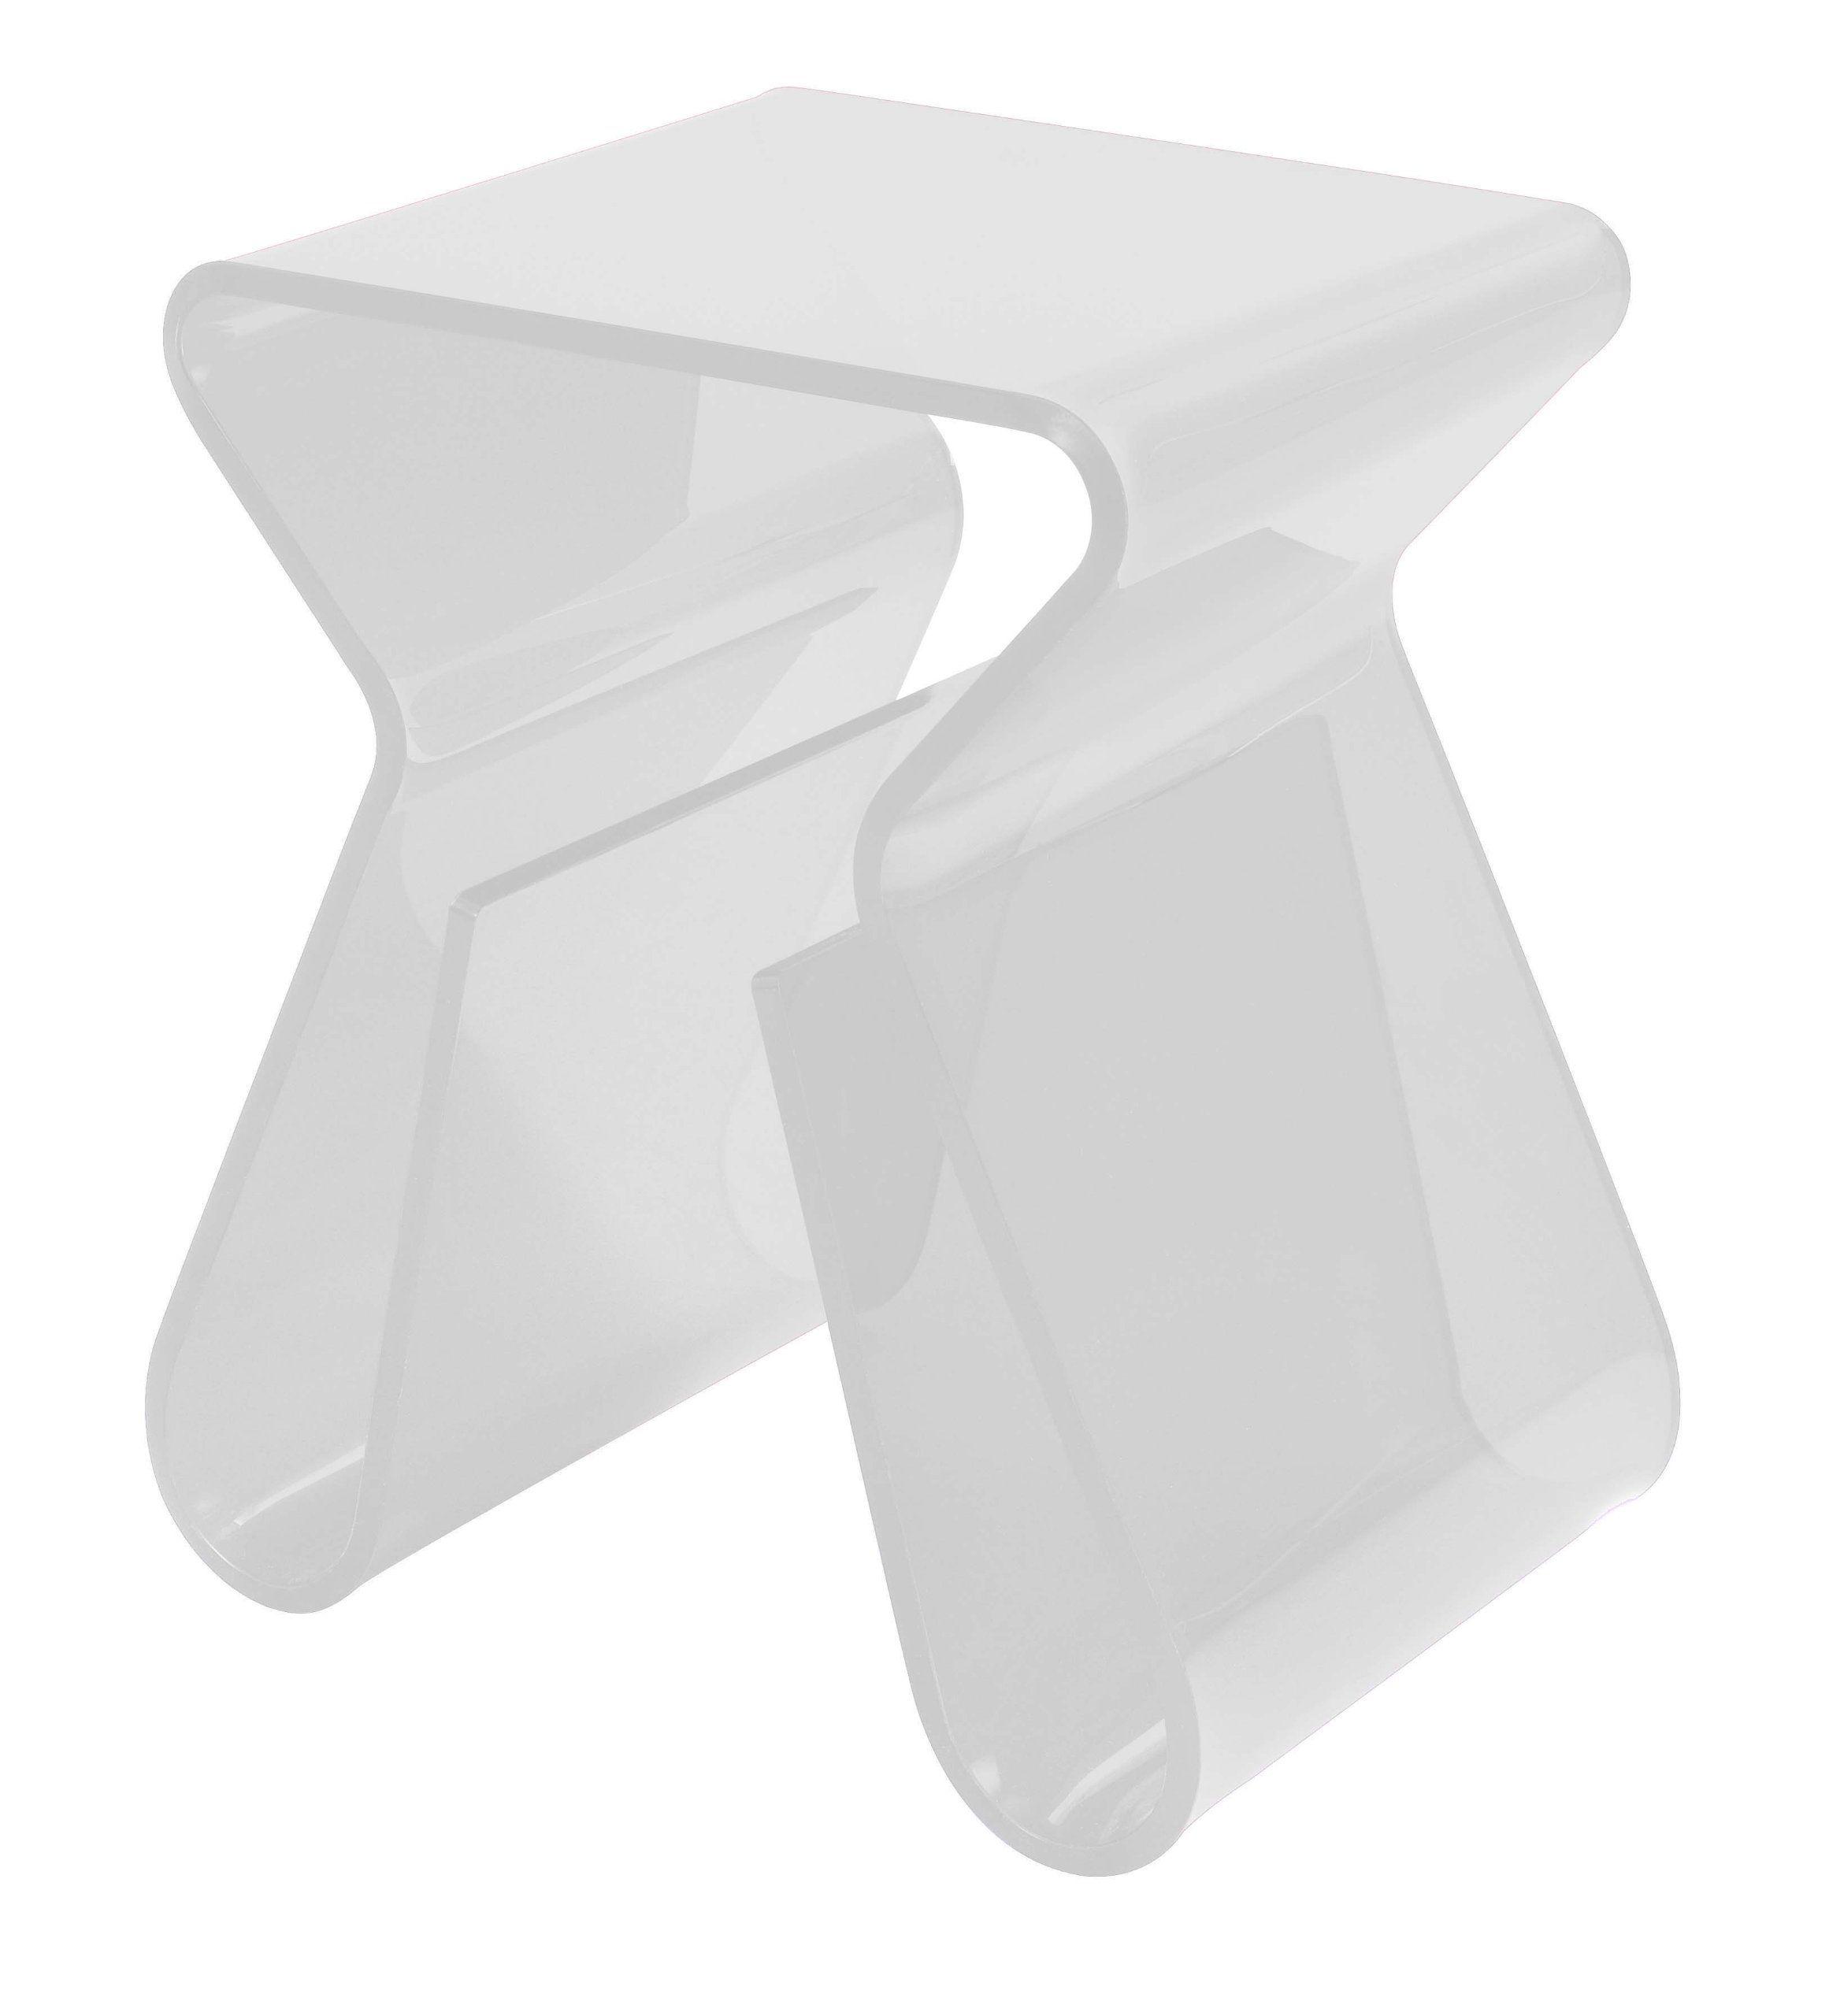 Transparent Polycarbonate End Table Furniture